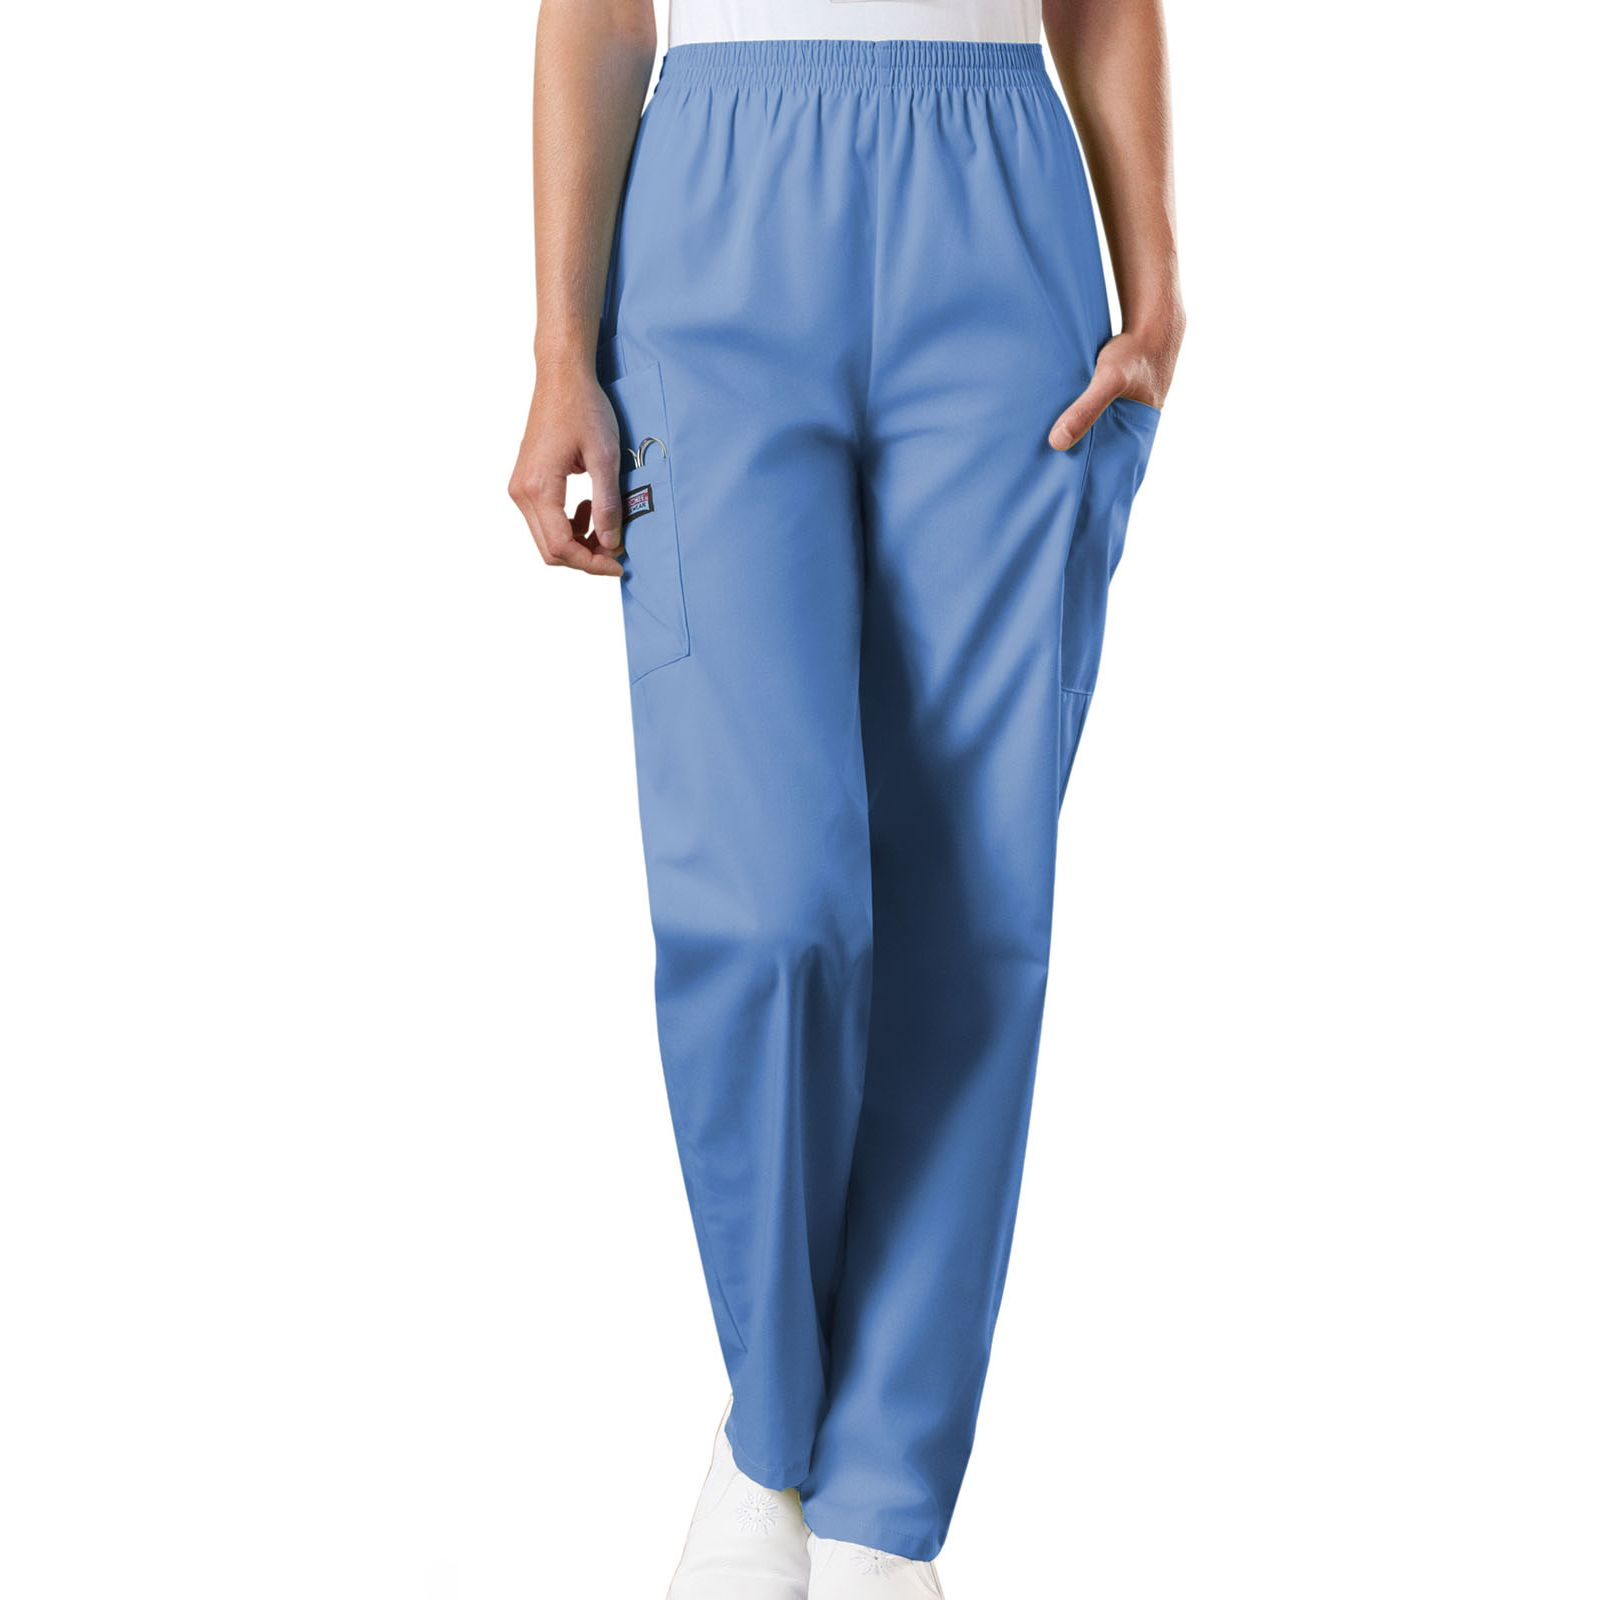 Pantalon médical élastique Unisexe, Cherokee Workwear Originals (4200) bleu ciel